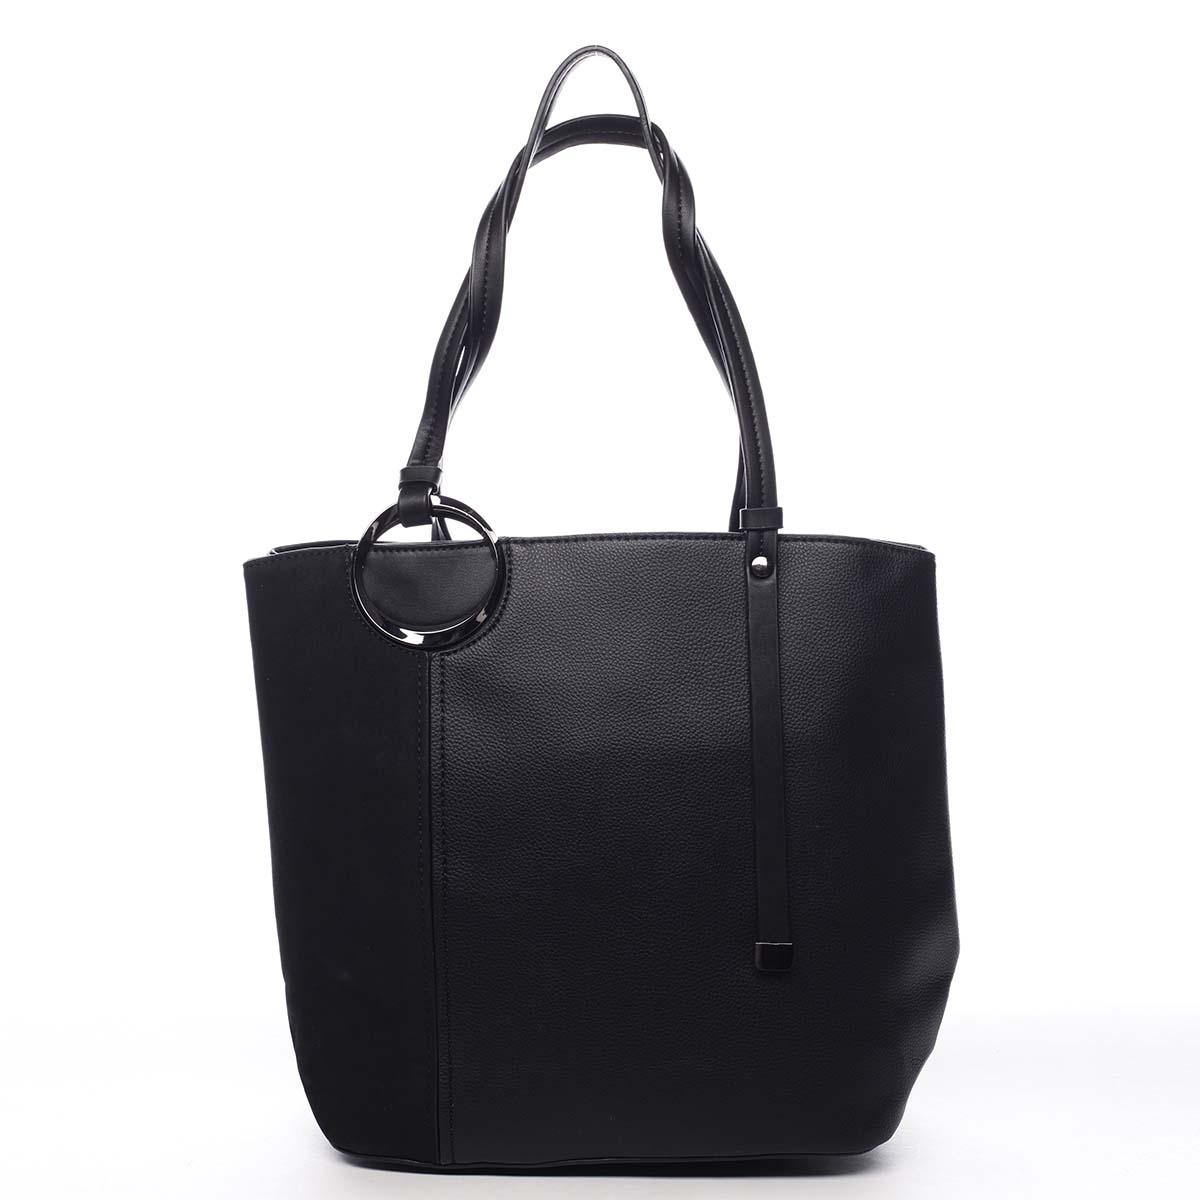 Elegantná kabelka cez rameno čierna - Maria C Ellize čierna